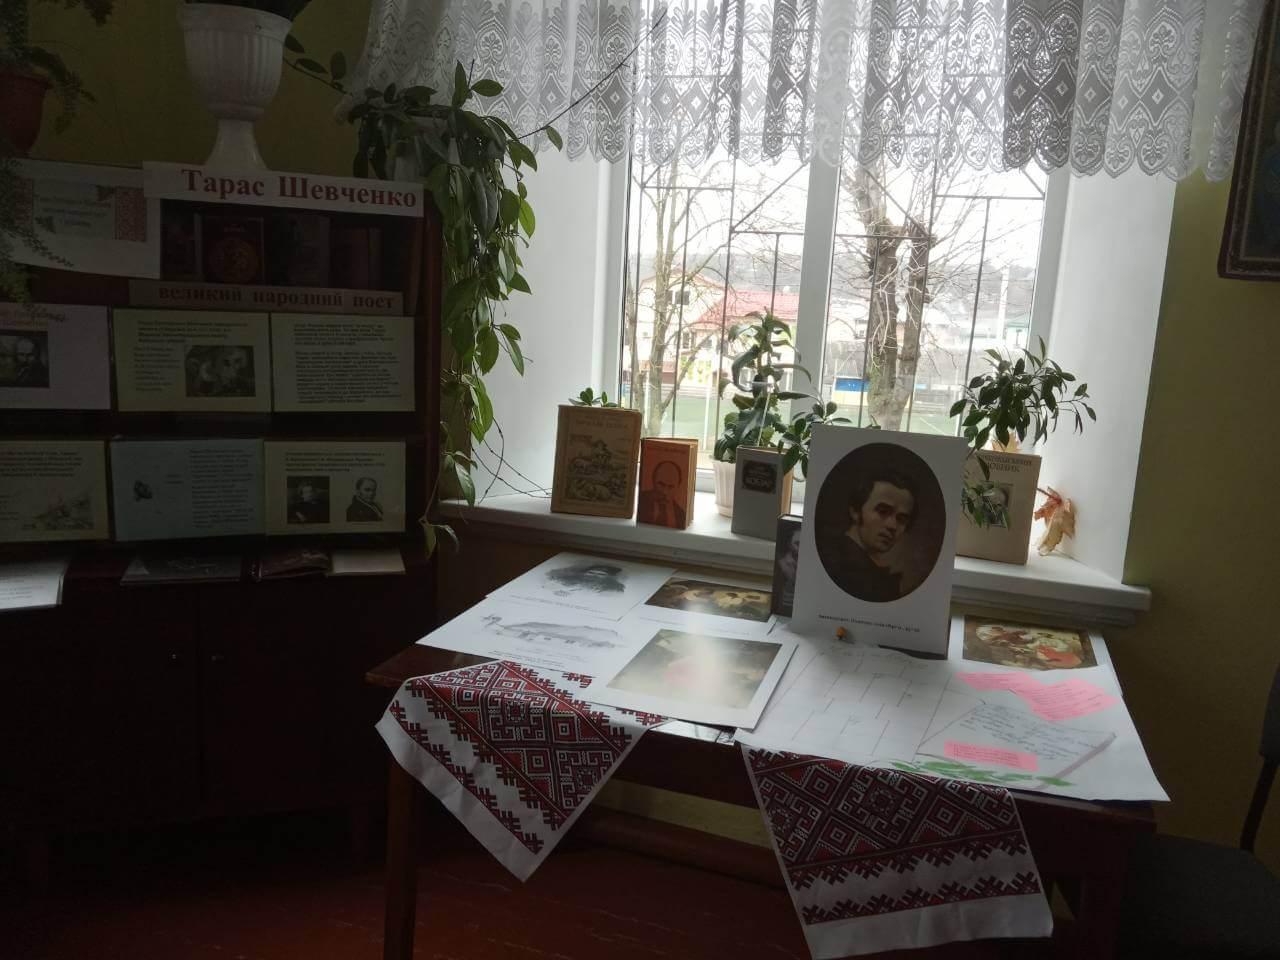 zobrazhennya viber 2020 03 12 13 21 36 - Живи, Кобзарю, в пам'яті людській